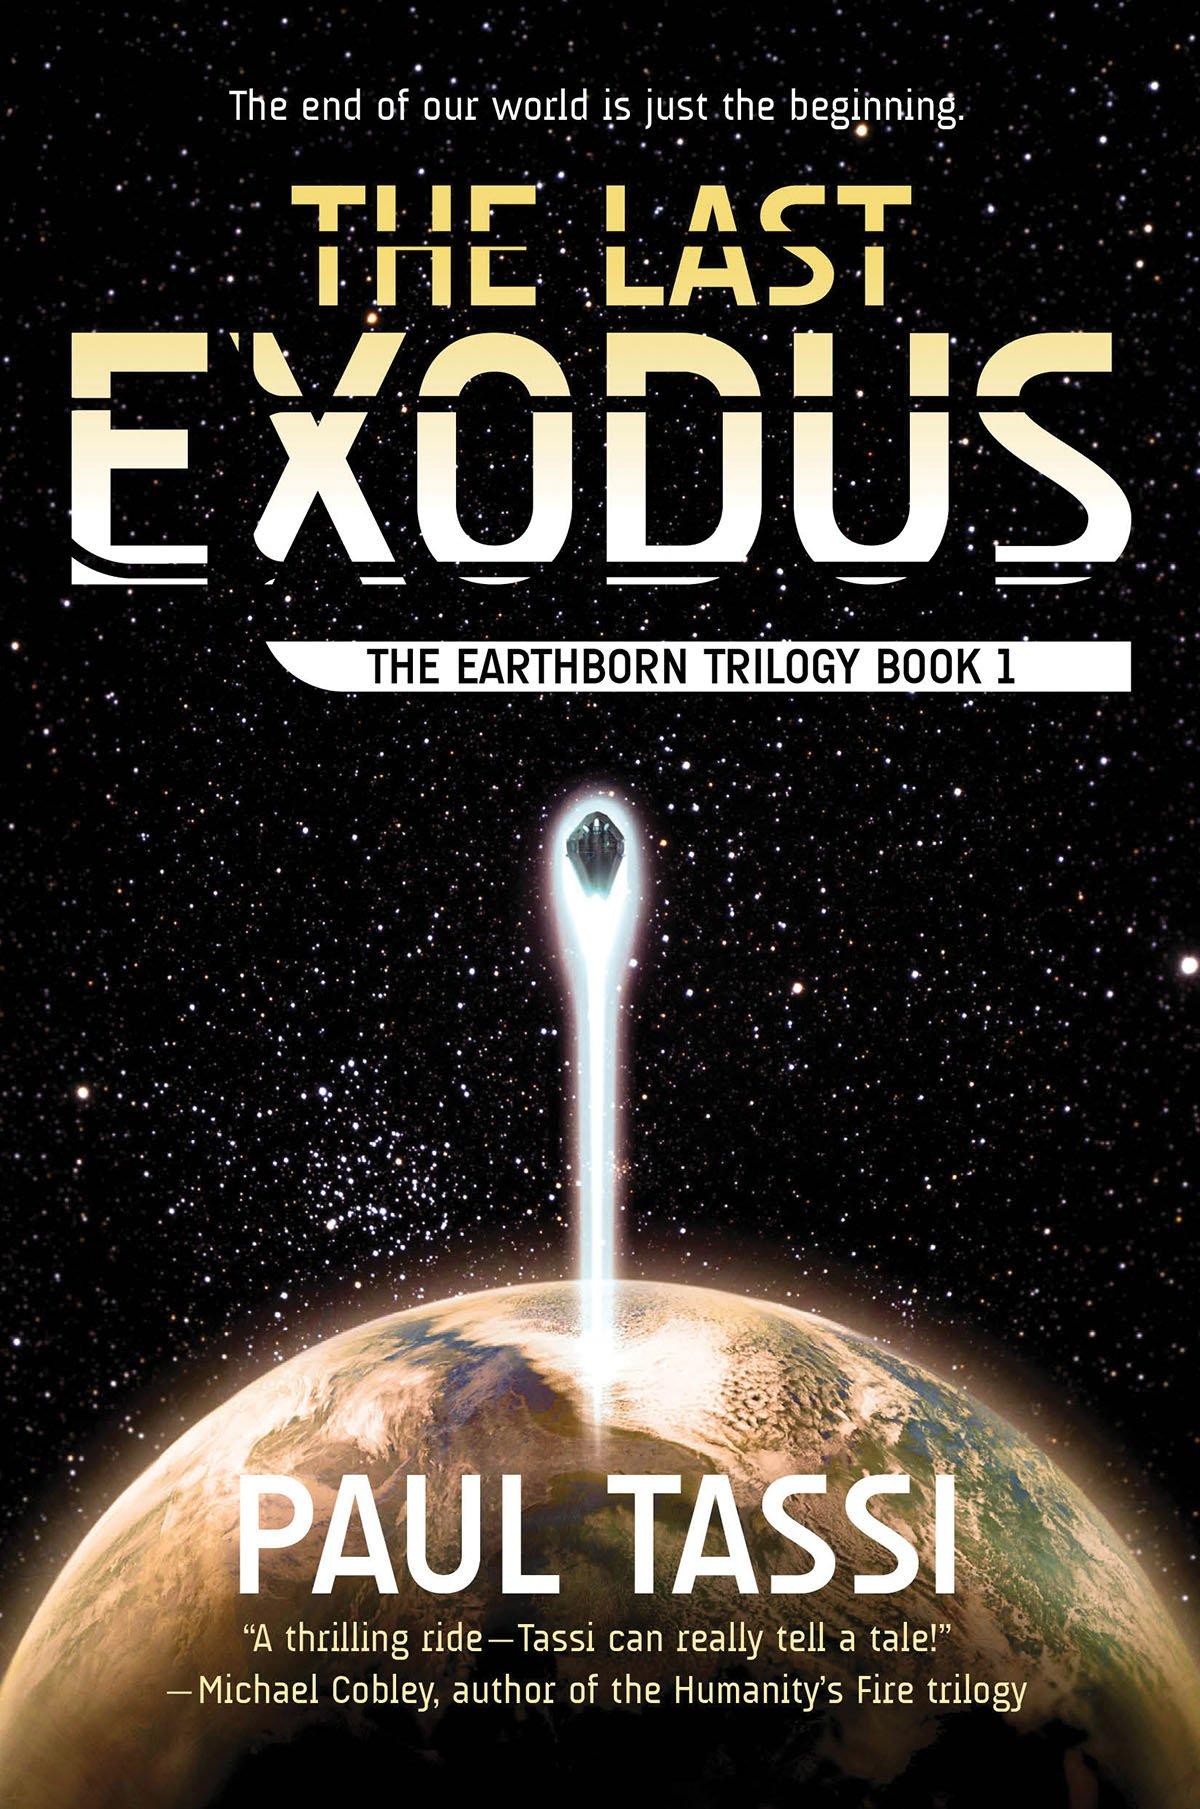 Amazon.com: The Last Exodus: The Earthborn Trilogy, Book 1 (9781940456379):  Paul Tassi: Books